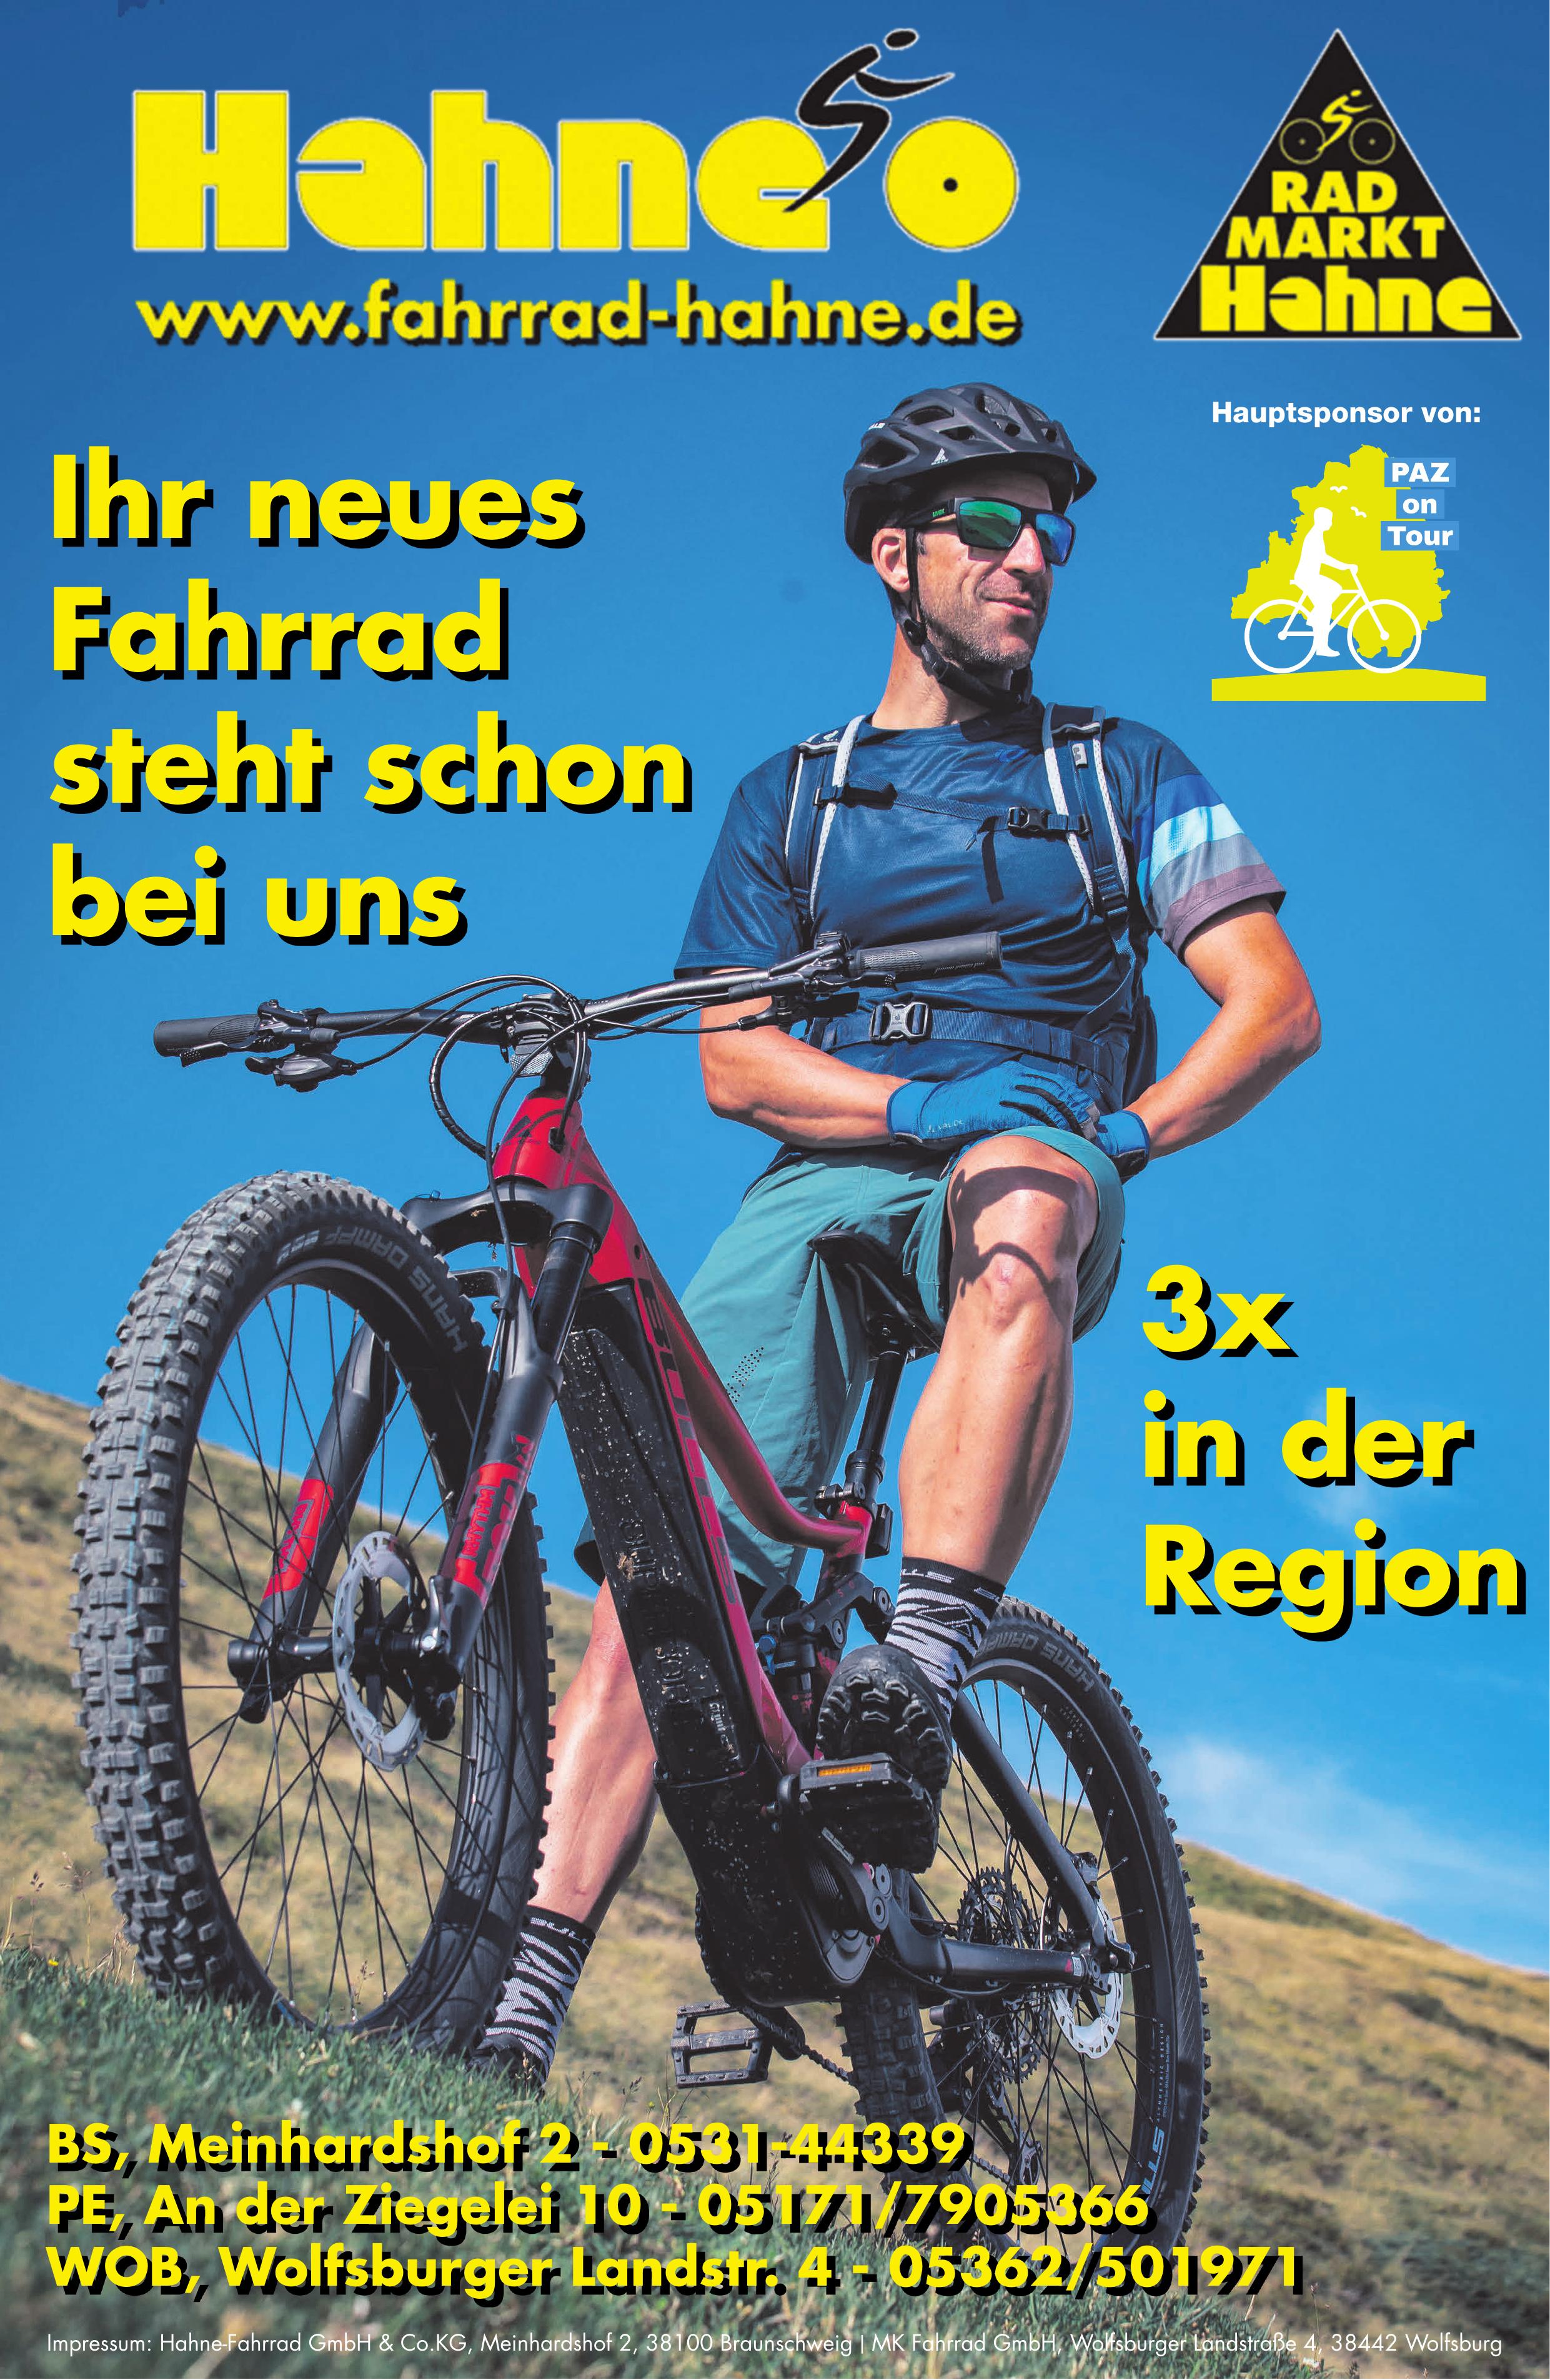 Hahne-Fahrrad GmbH & Co.KG